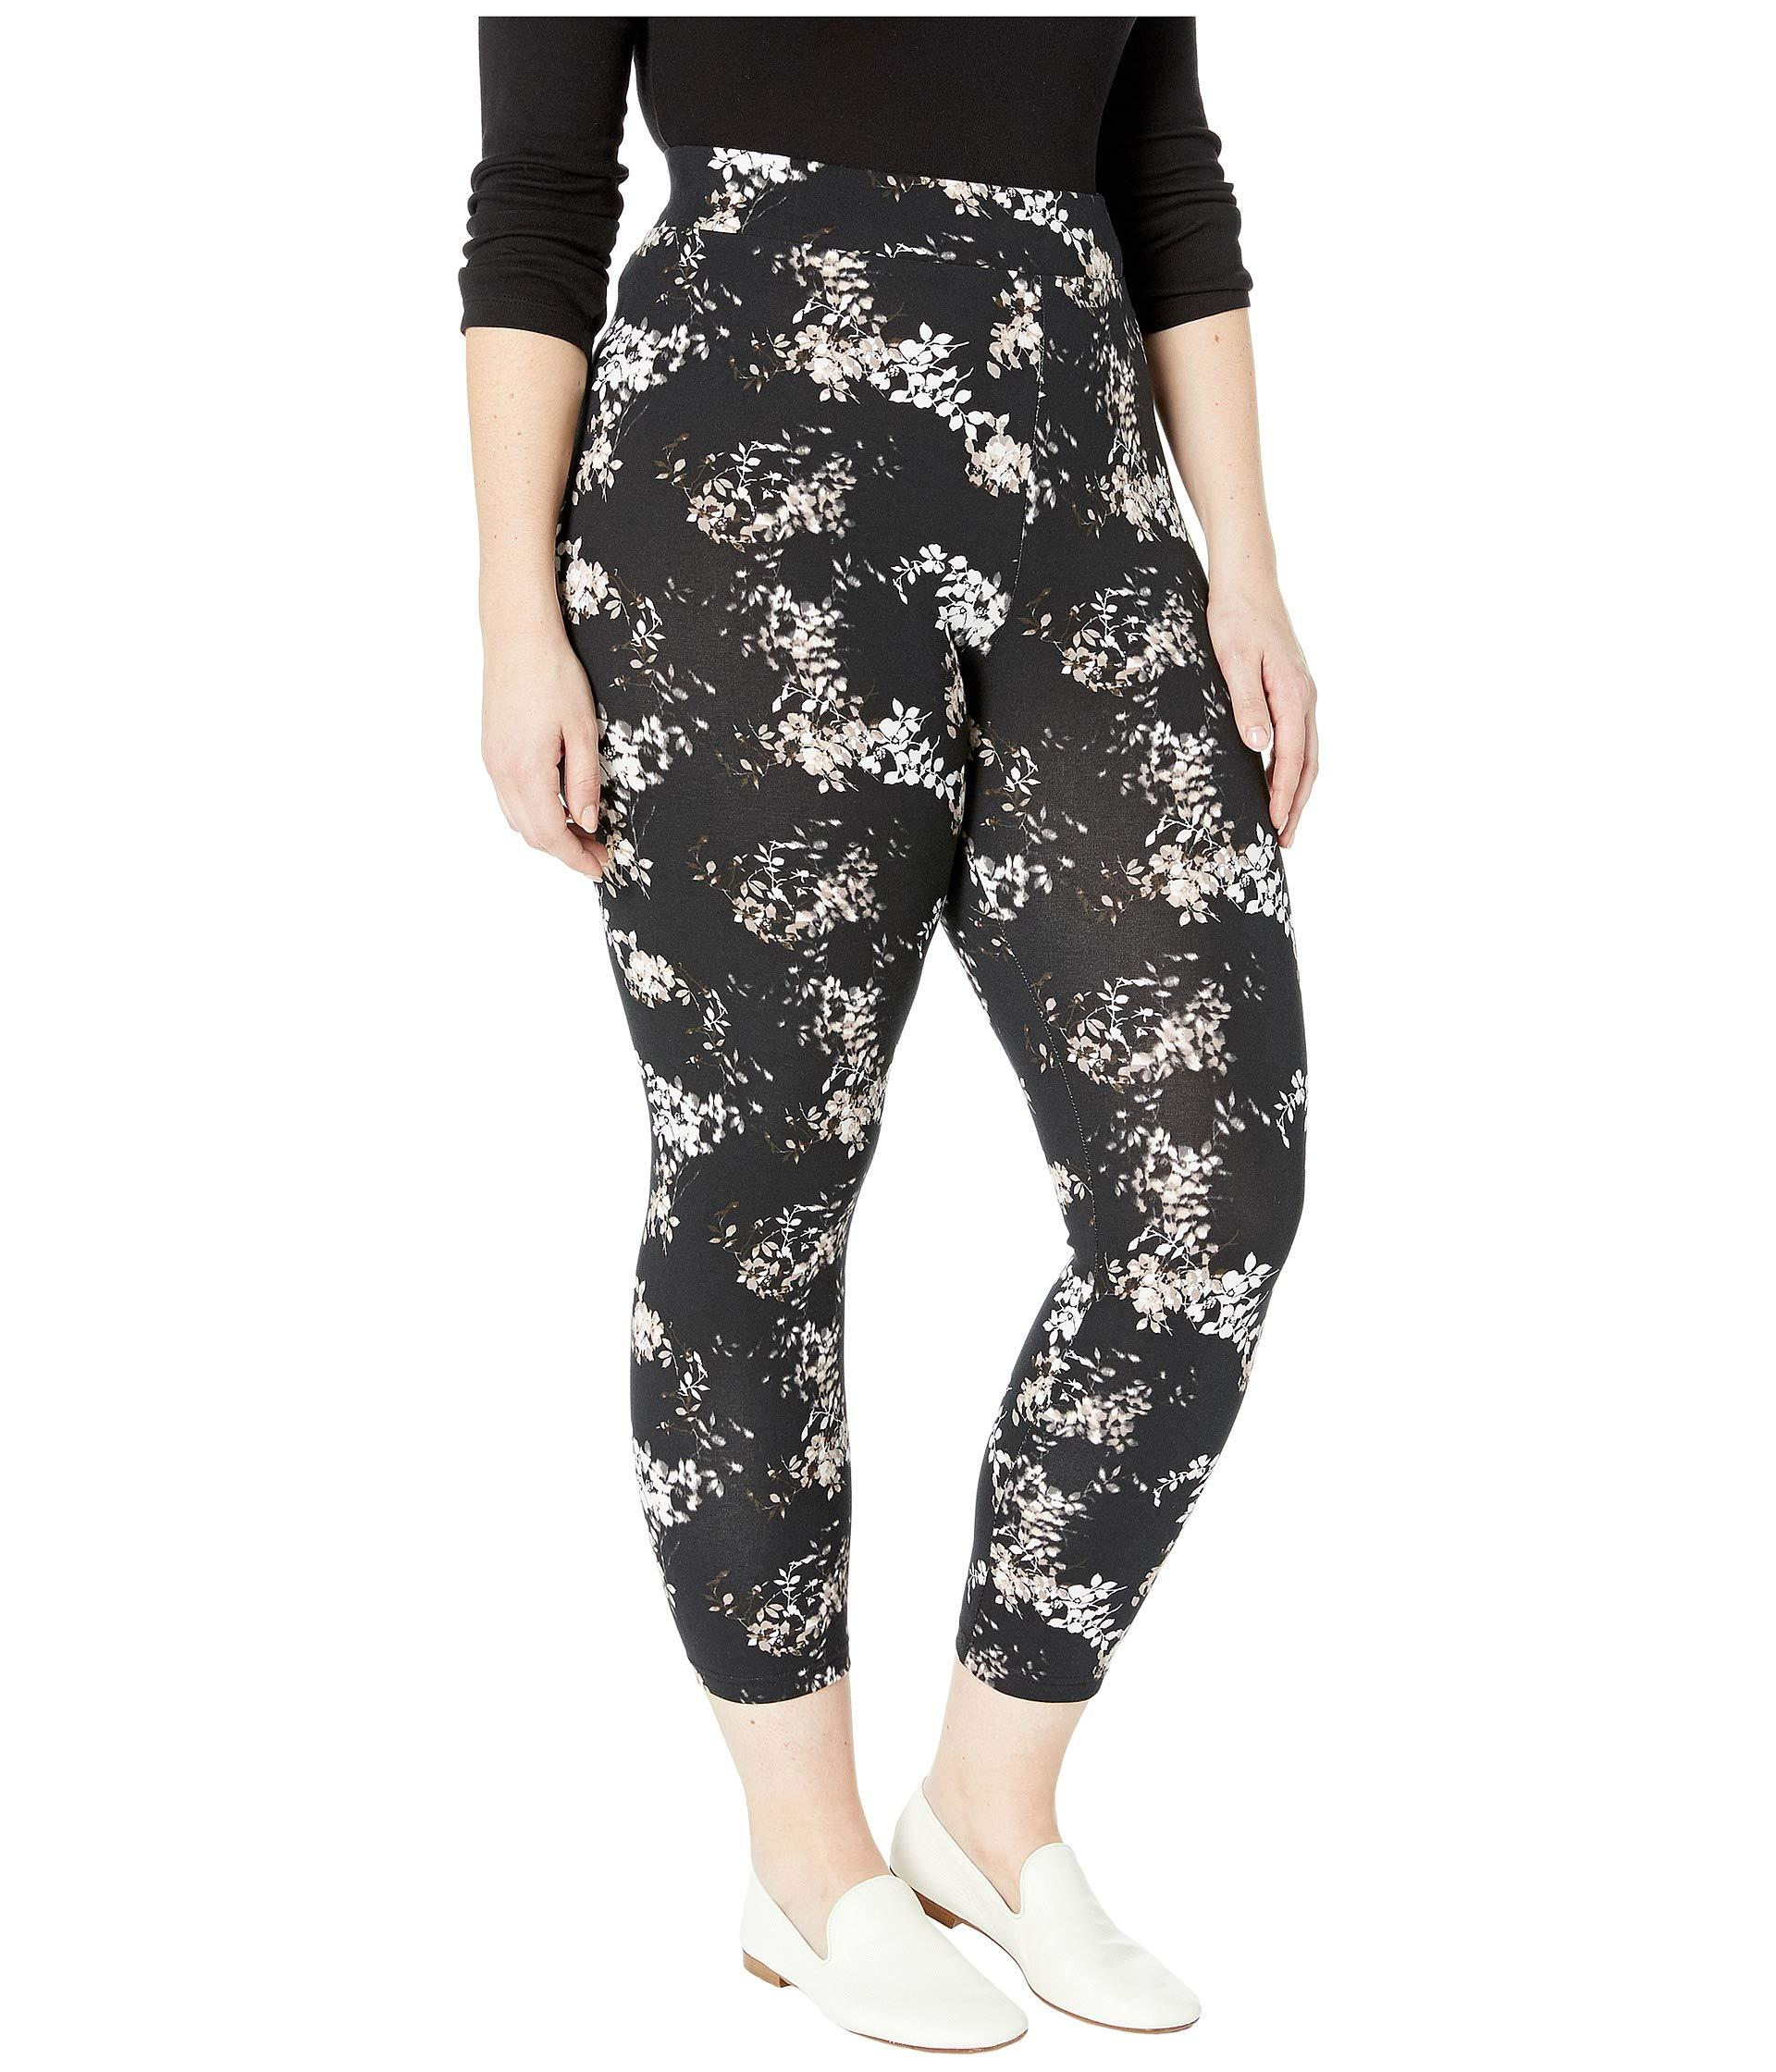 a8fb2f392b404 Hue Plus Size Watercolor Floral Cotton Capri Leggings (black ...